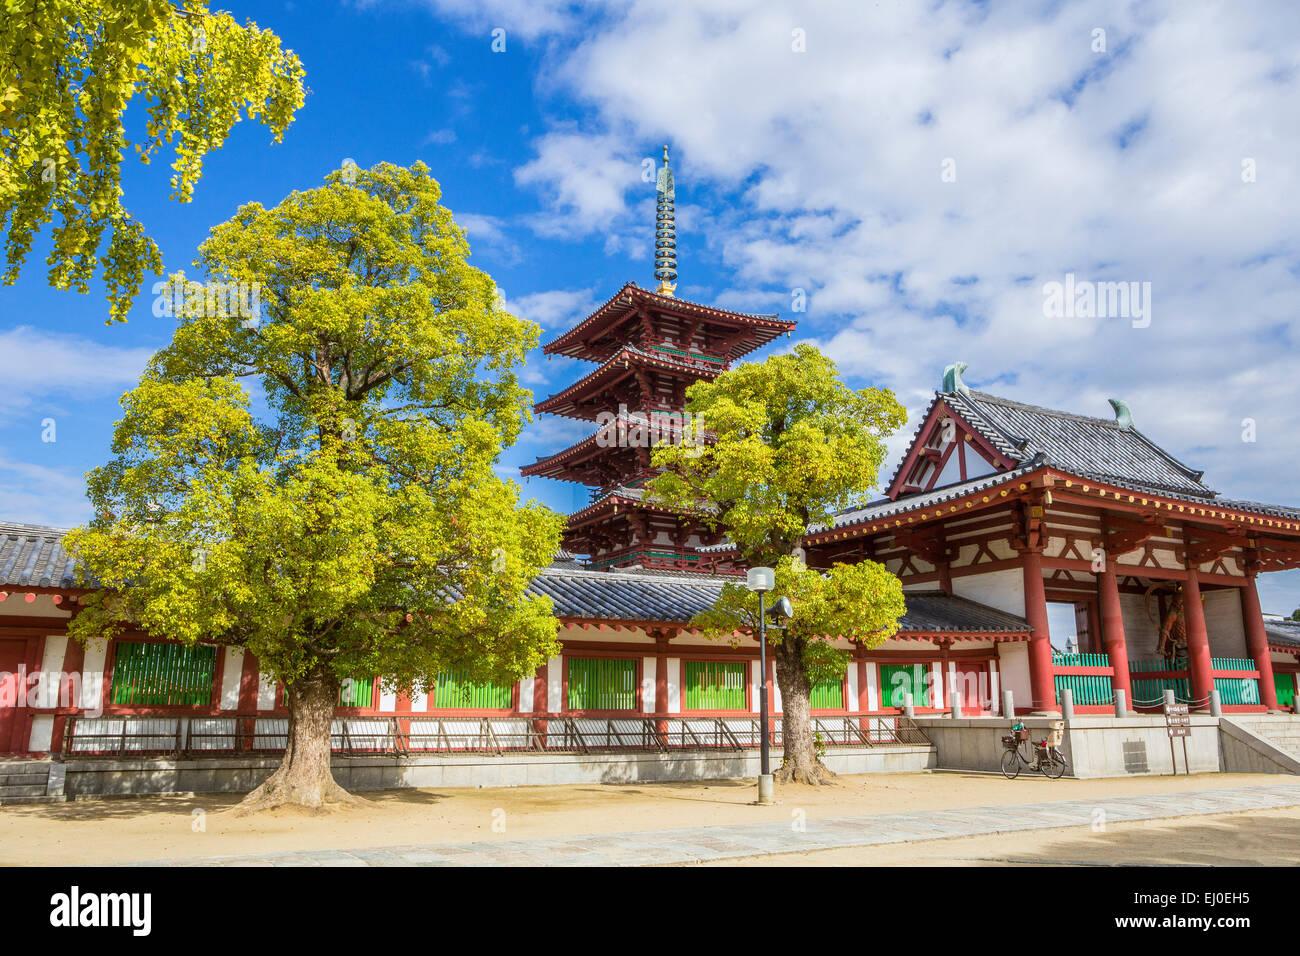 Giappone, Asia, Kansai di Osaka, Città, Shitennoji, tempio, patrimonio mondiale, l'architettura, la storia, Immagini Stock